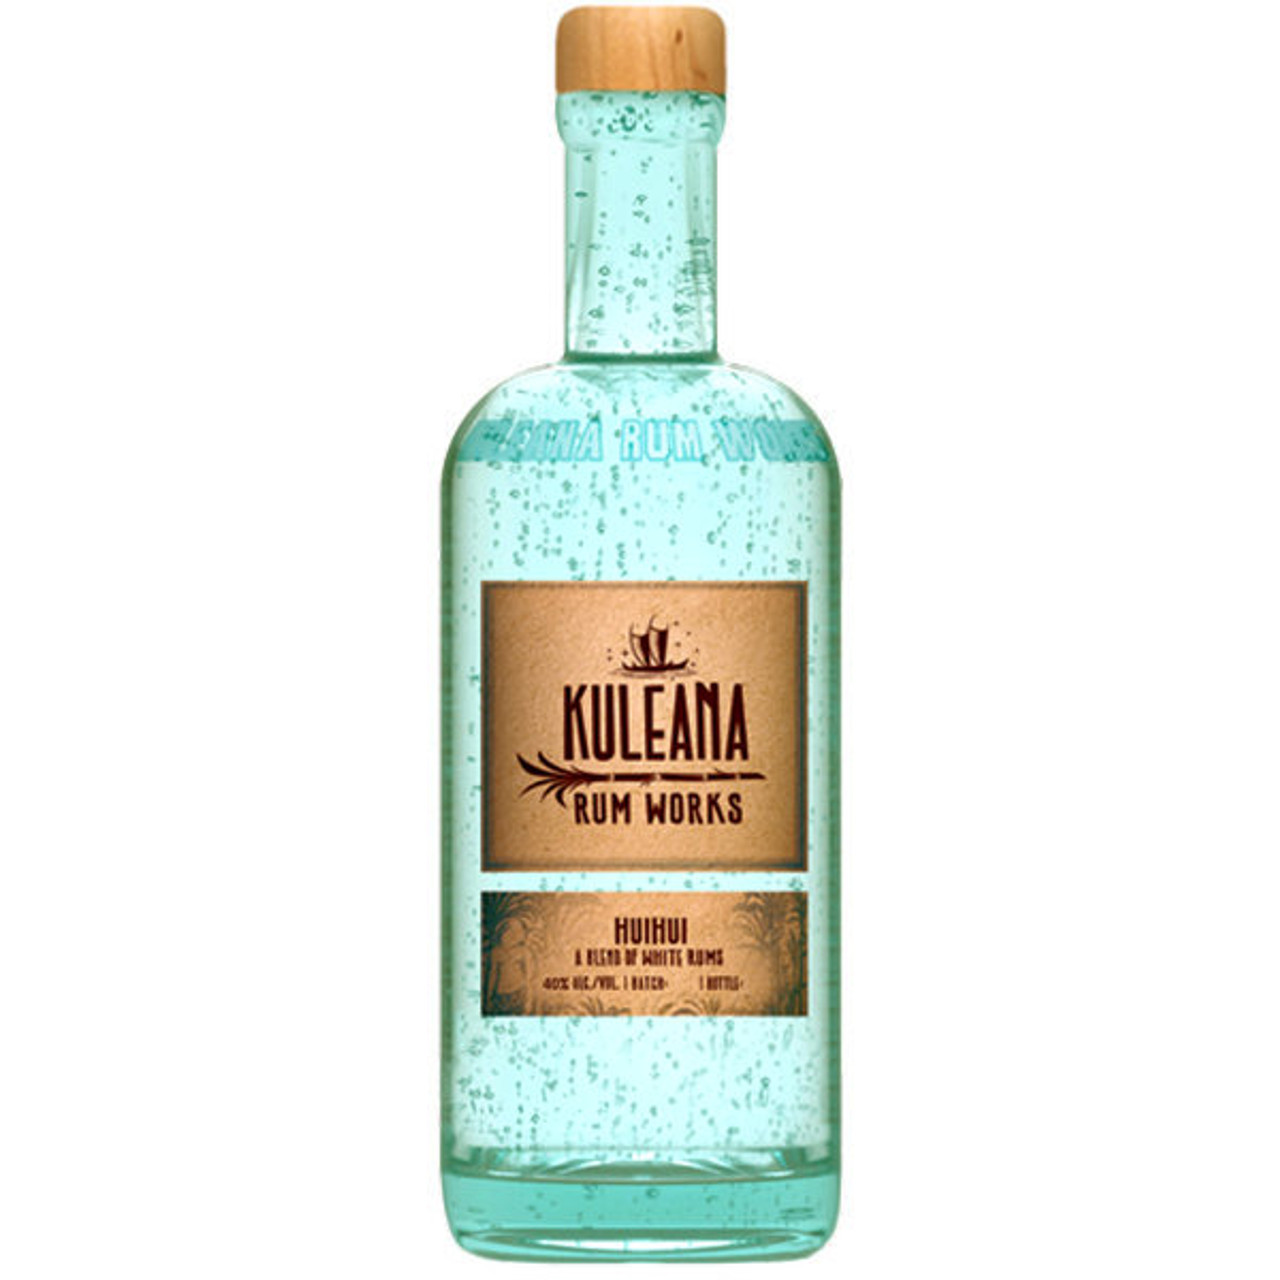 Kuleana Rum Works Huihui Blended White Rum 750ml